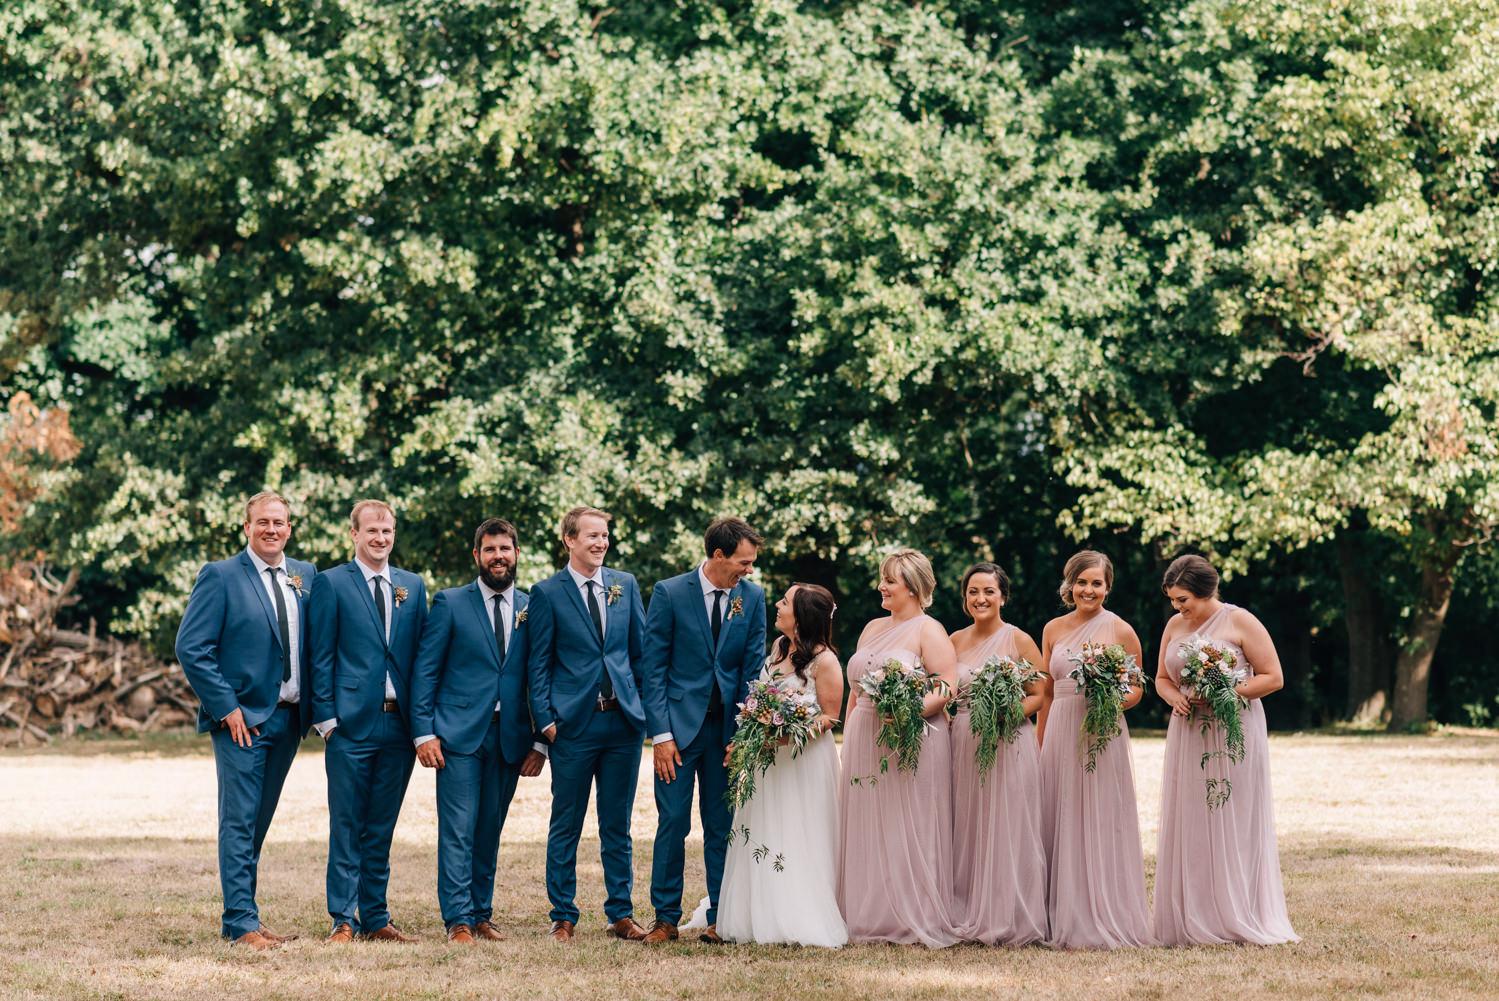 Quamby-Wedding-Photographer-100.jpg